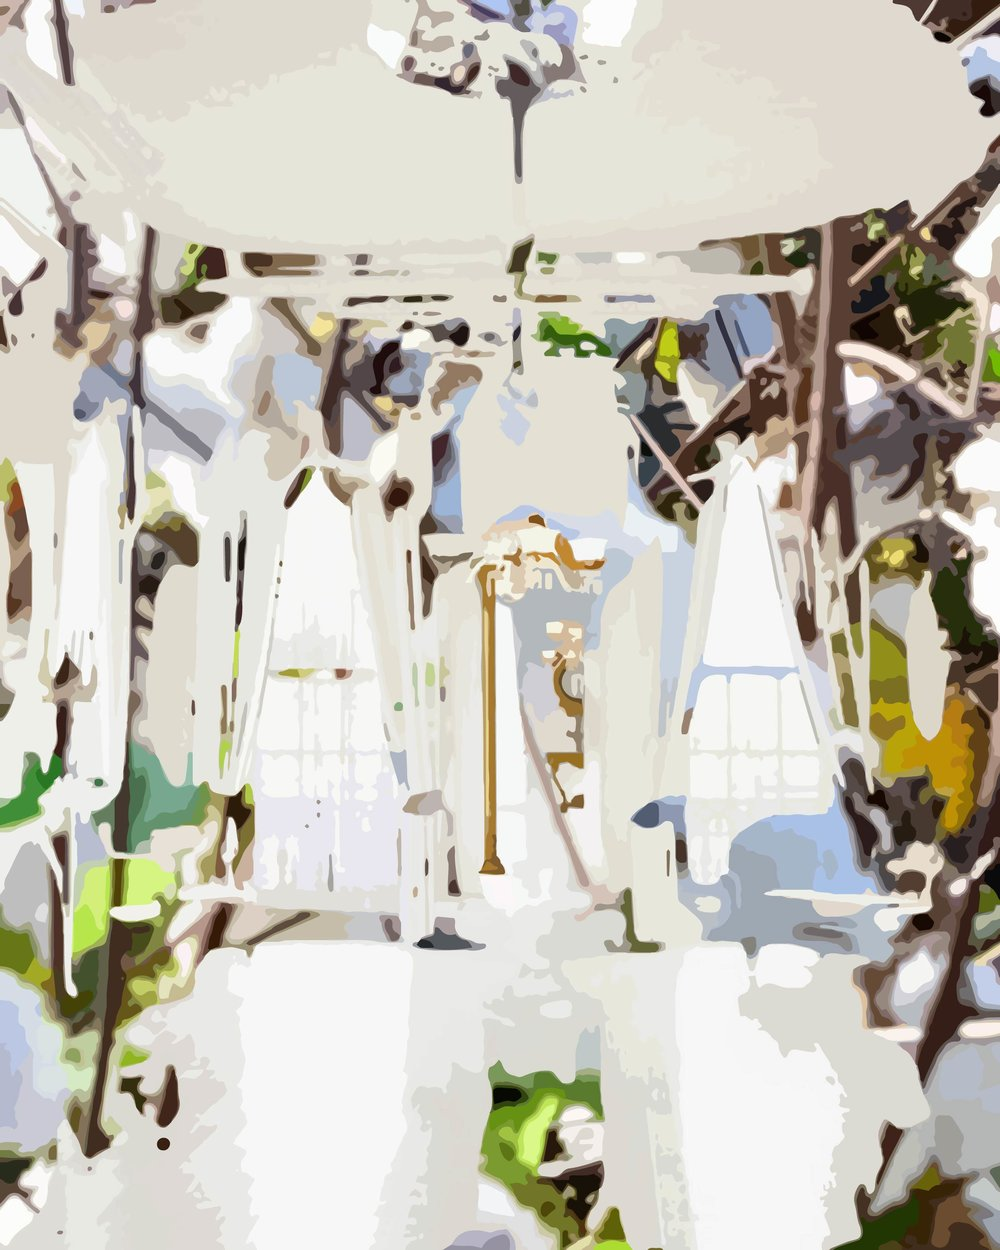 Interior/exterior Nottoway Plantation (Cotton Kingdom)    Oil on canvas 40 x 30 in